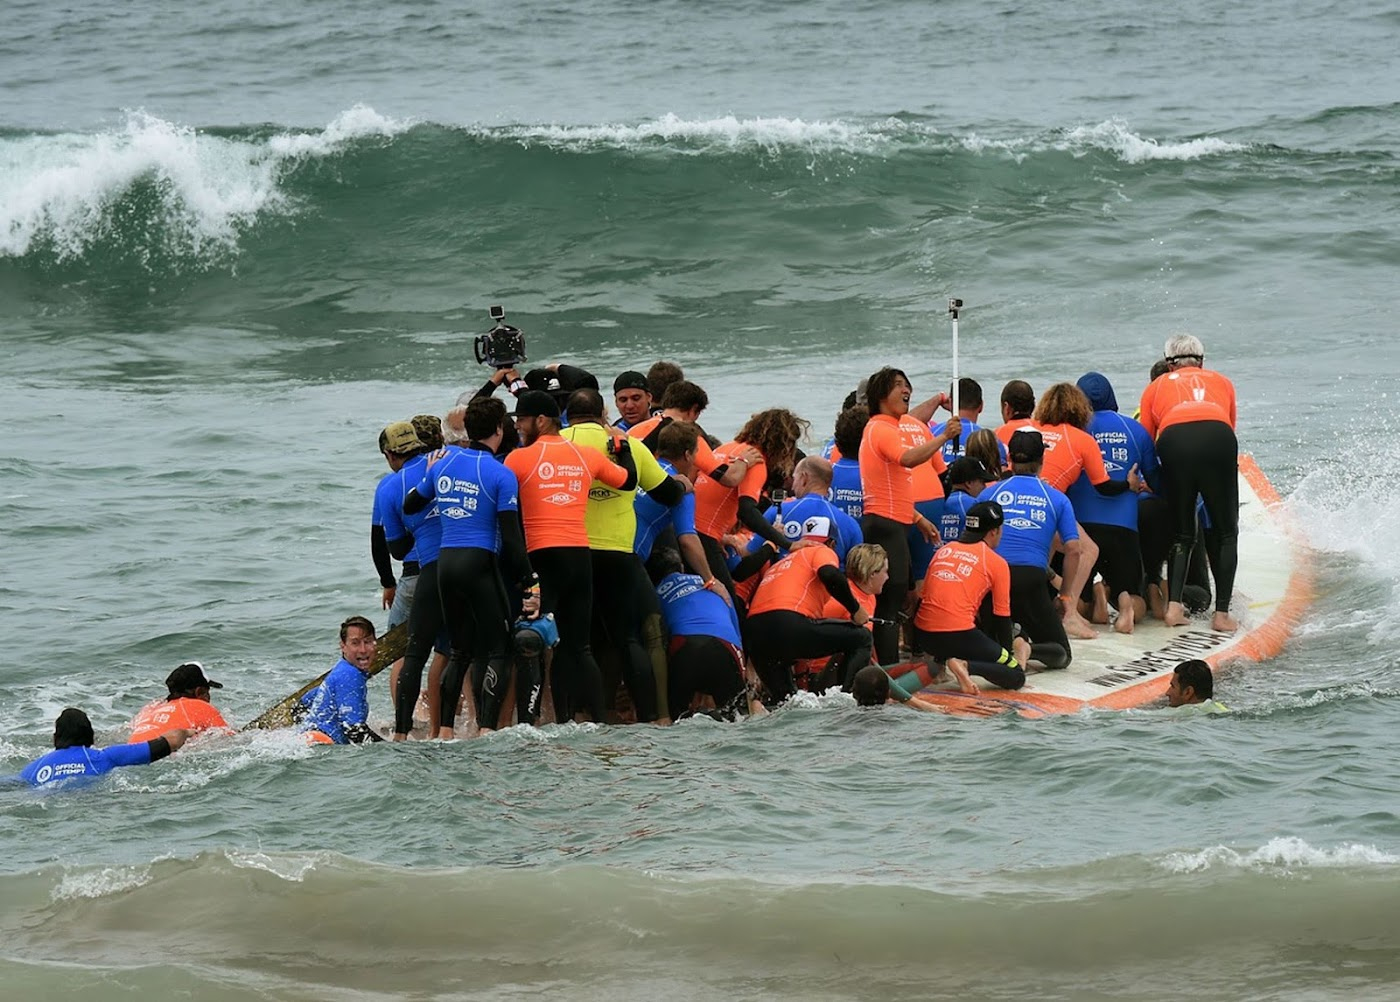 Worlds largest surfboard 03